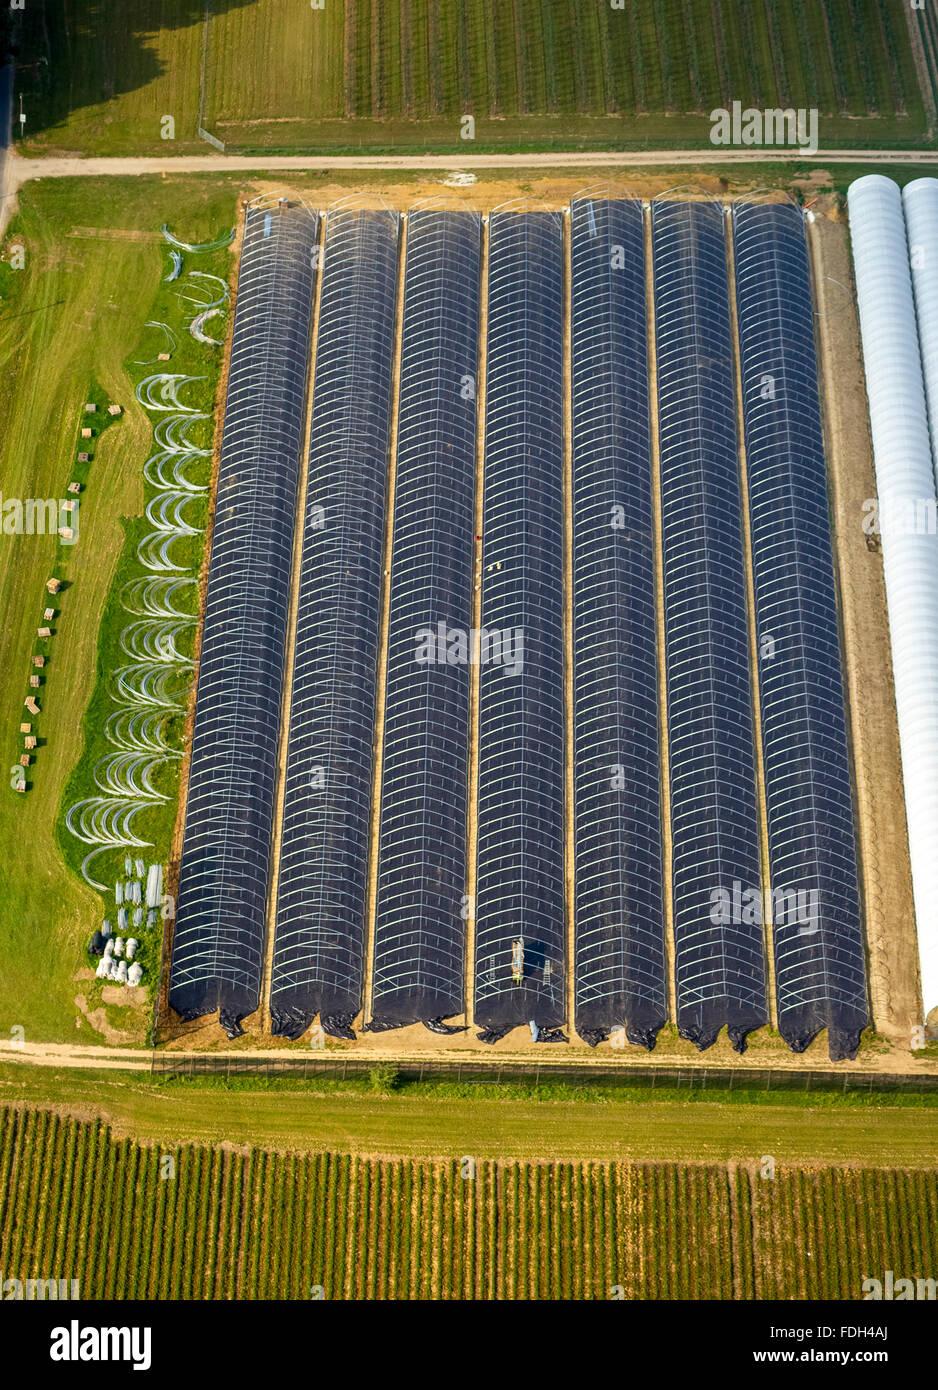 Air, Greenhouse, Bottrop, Ruhr region, Kirchhellen, North Rhine Westphalia, Germany, Europe, Aerial view, birds - Stock Image